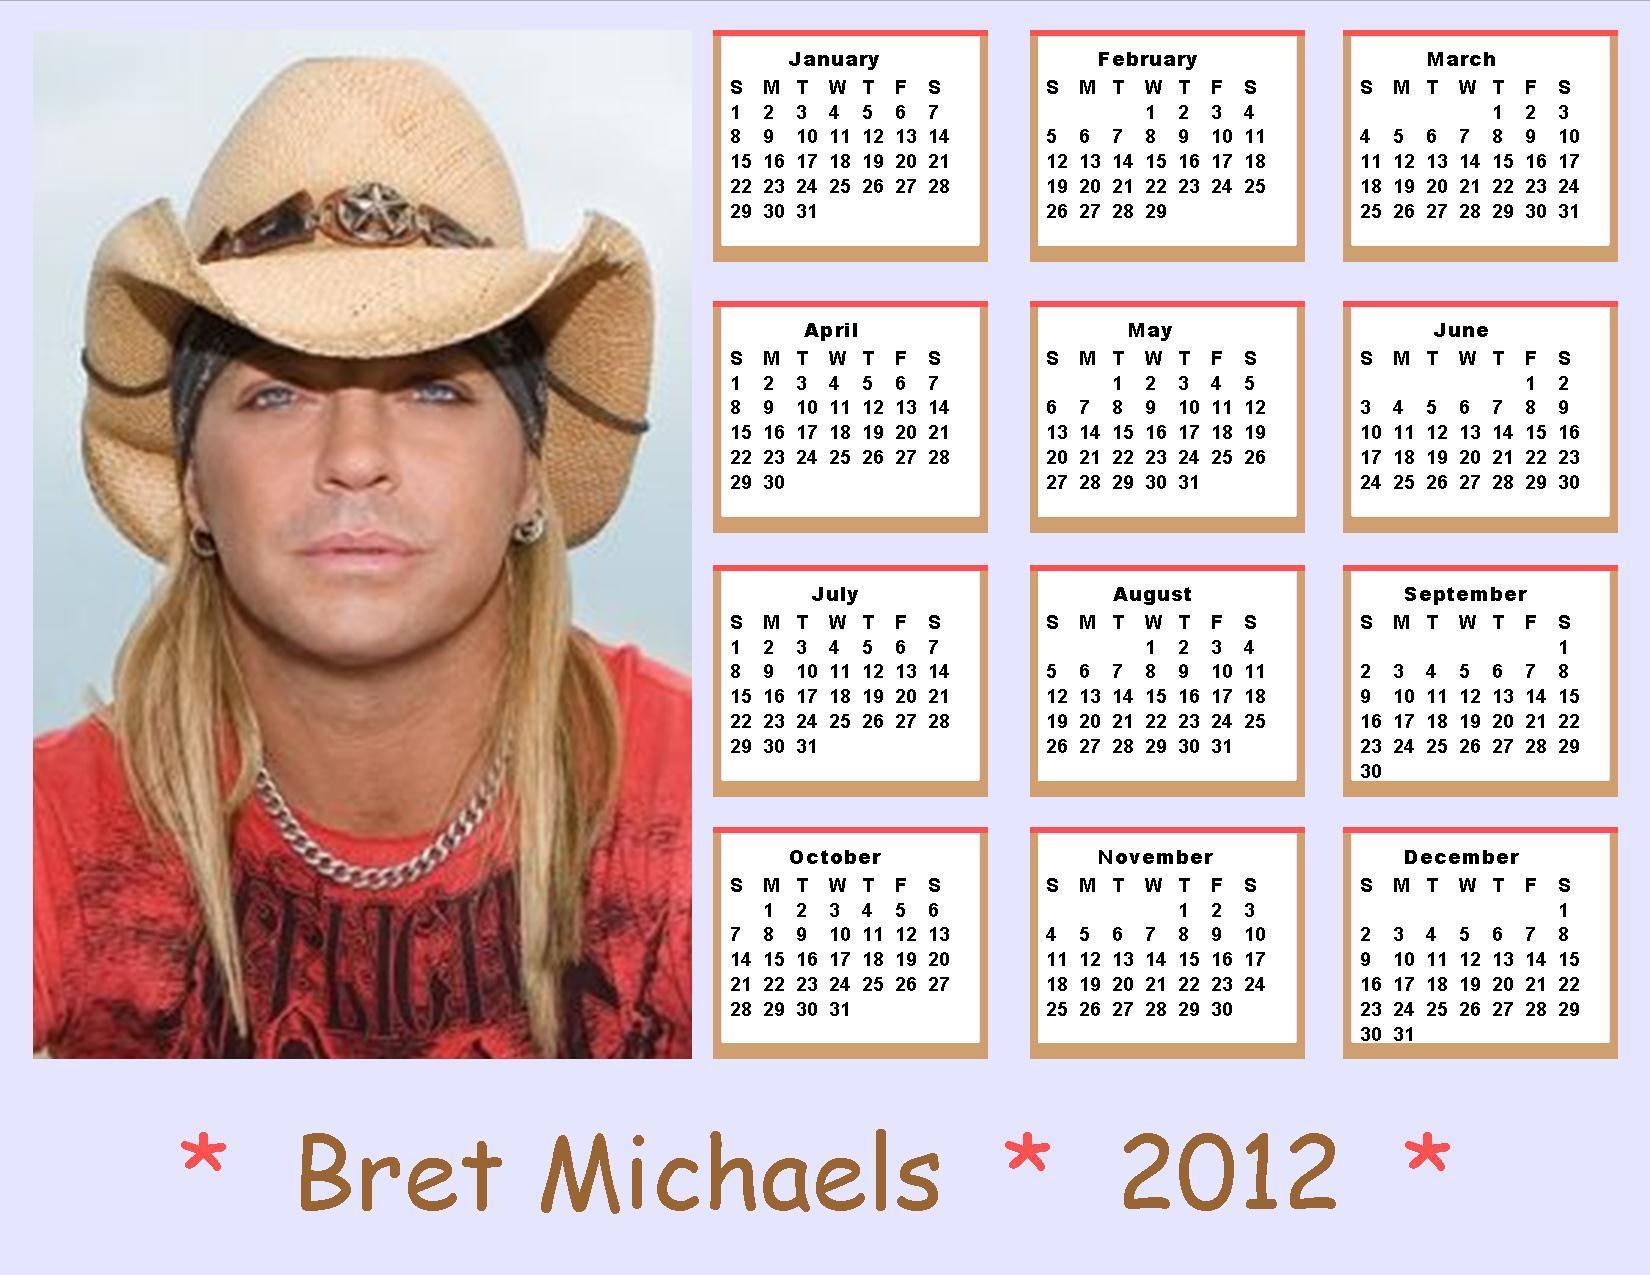 Bret Michaels images 2012 Bret Michaels Calendar HD wallpaper and